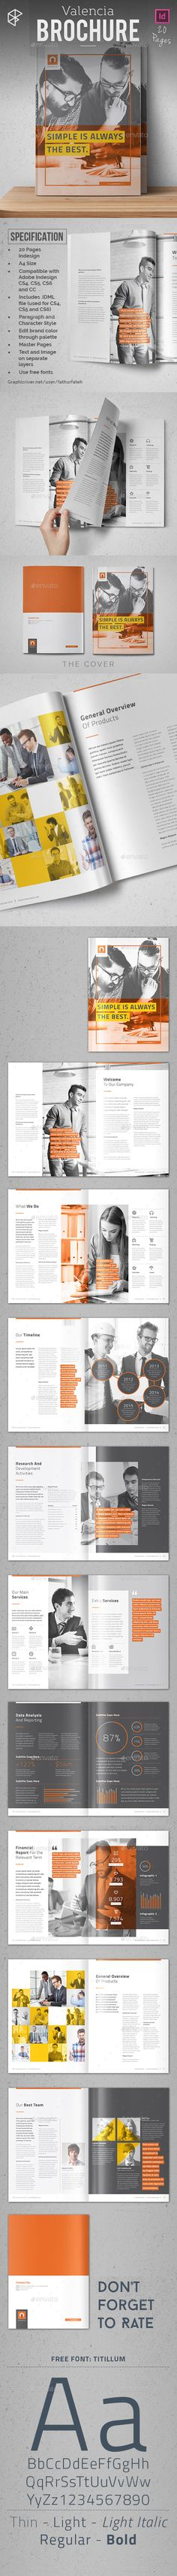 Valencia Brochure Template InDesign INDD. Download here: http://graphicriver.net/item/valencia-brochure/16288654?ref=ksioks